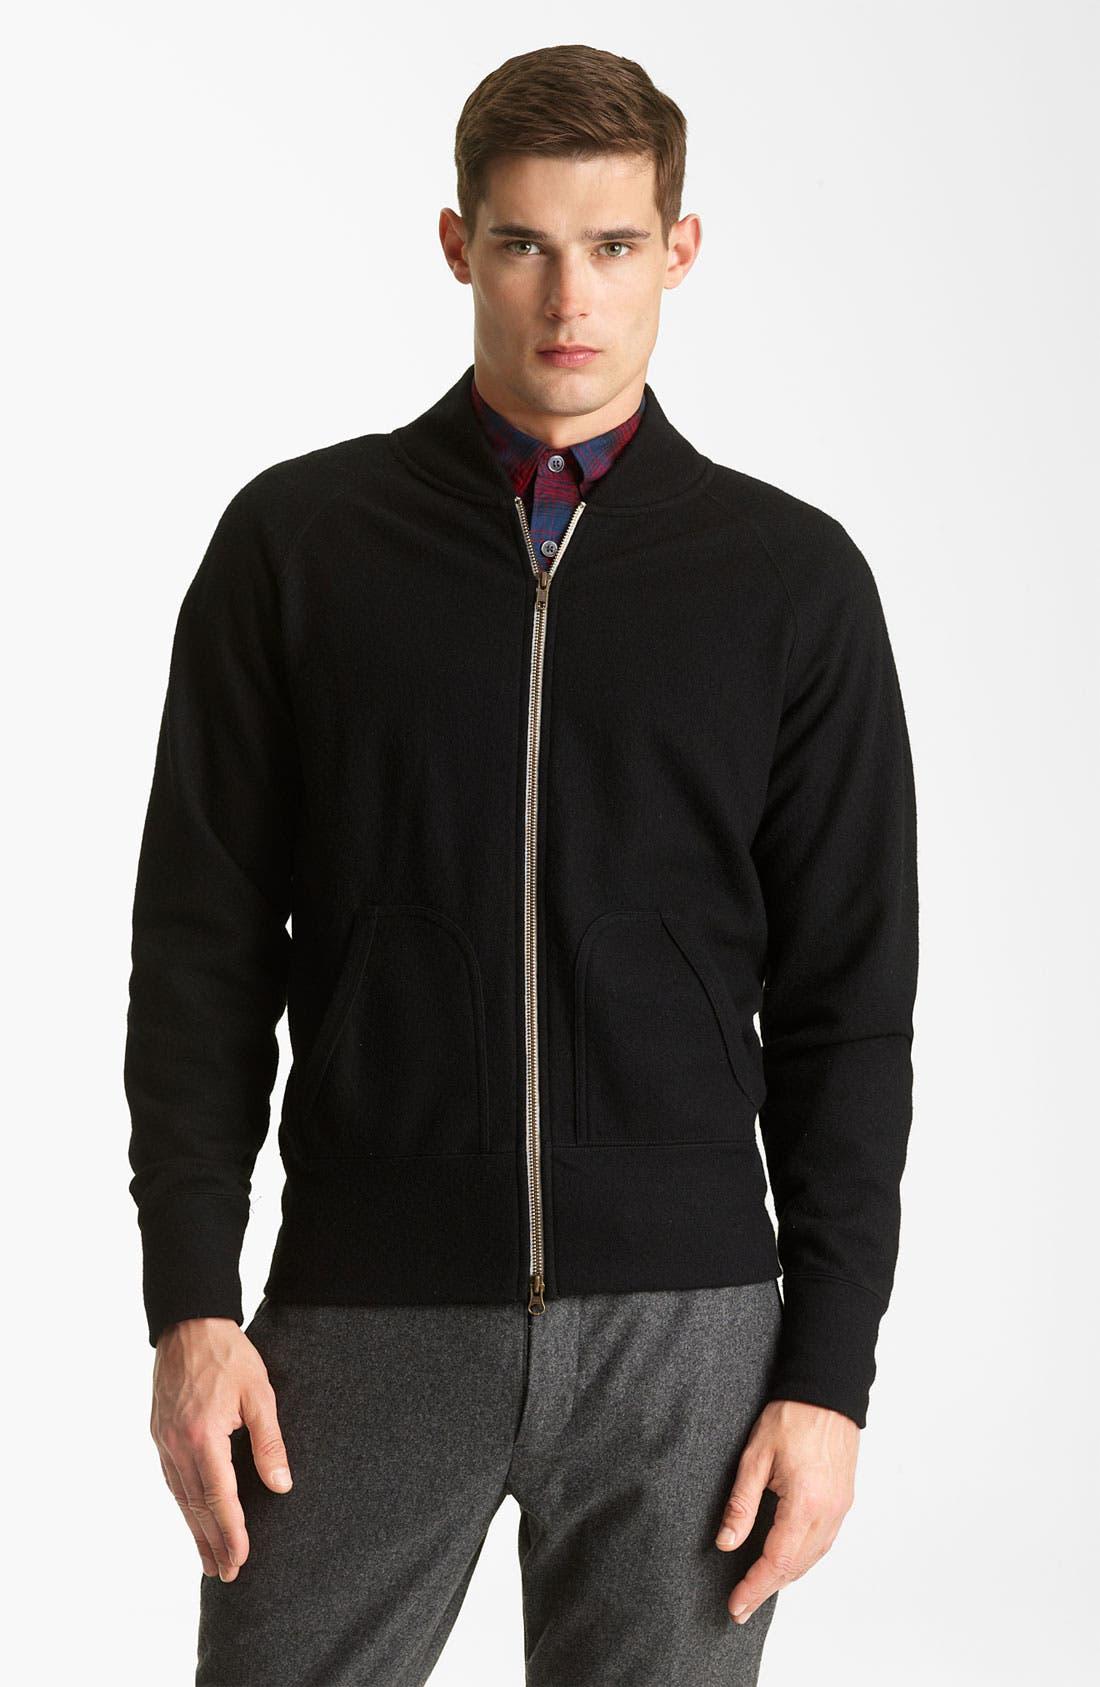 Alternate Image 1 Selected - Todd Snyder Wool Track Jacket